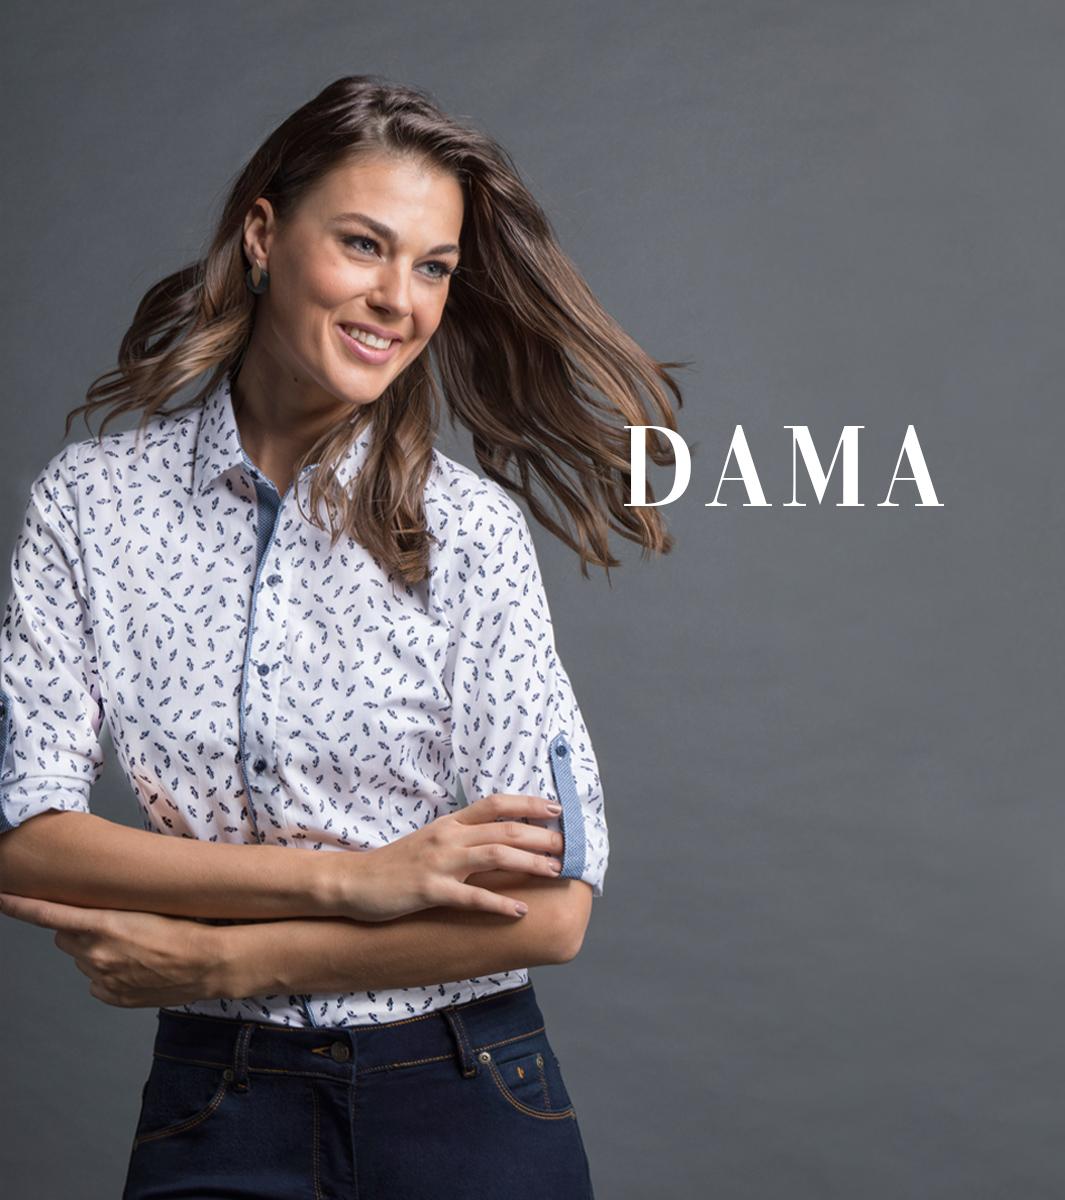 DAMA 2019